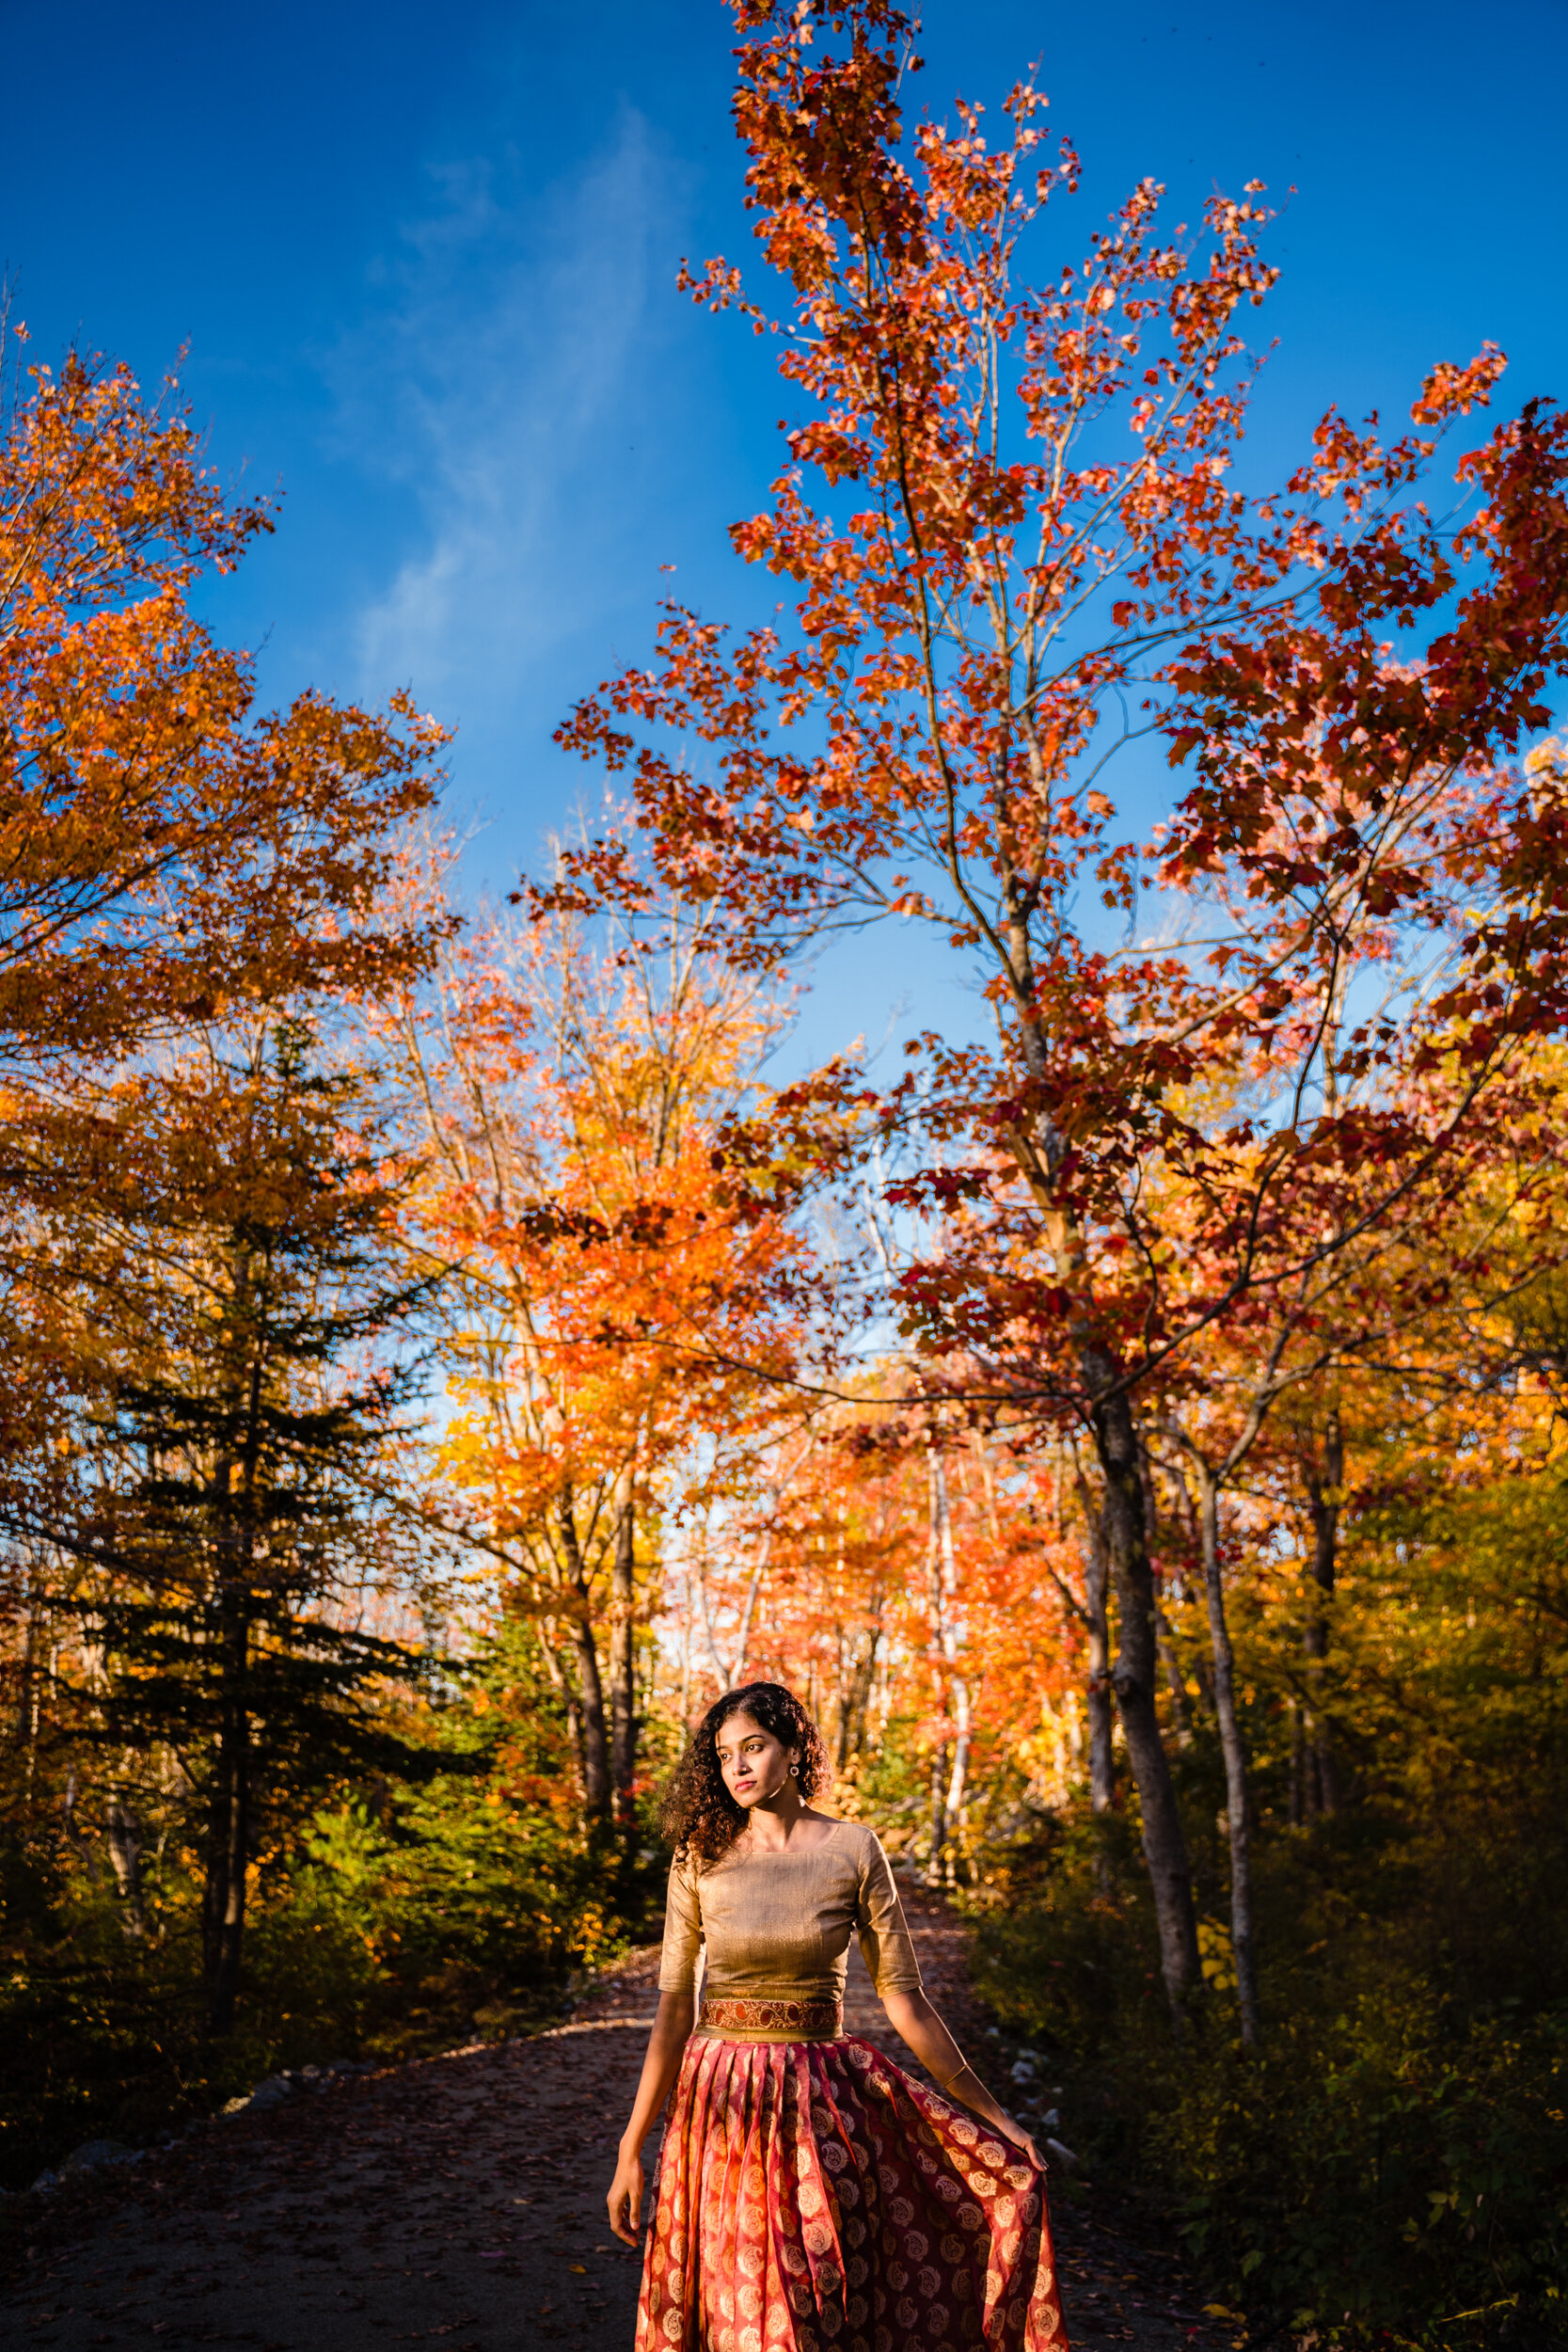 AJFallSession (2 of 14)halifax-photography-portrait-foxandfellow-fall.jpg